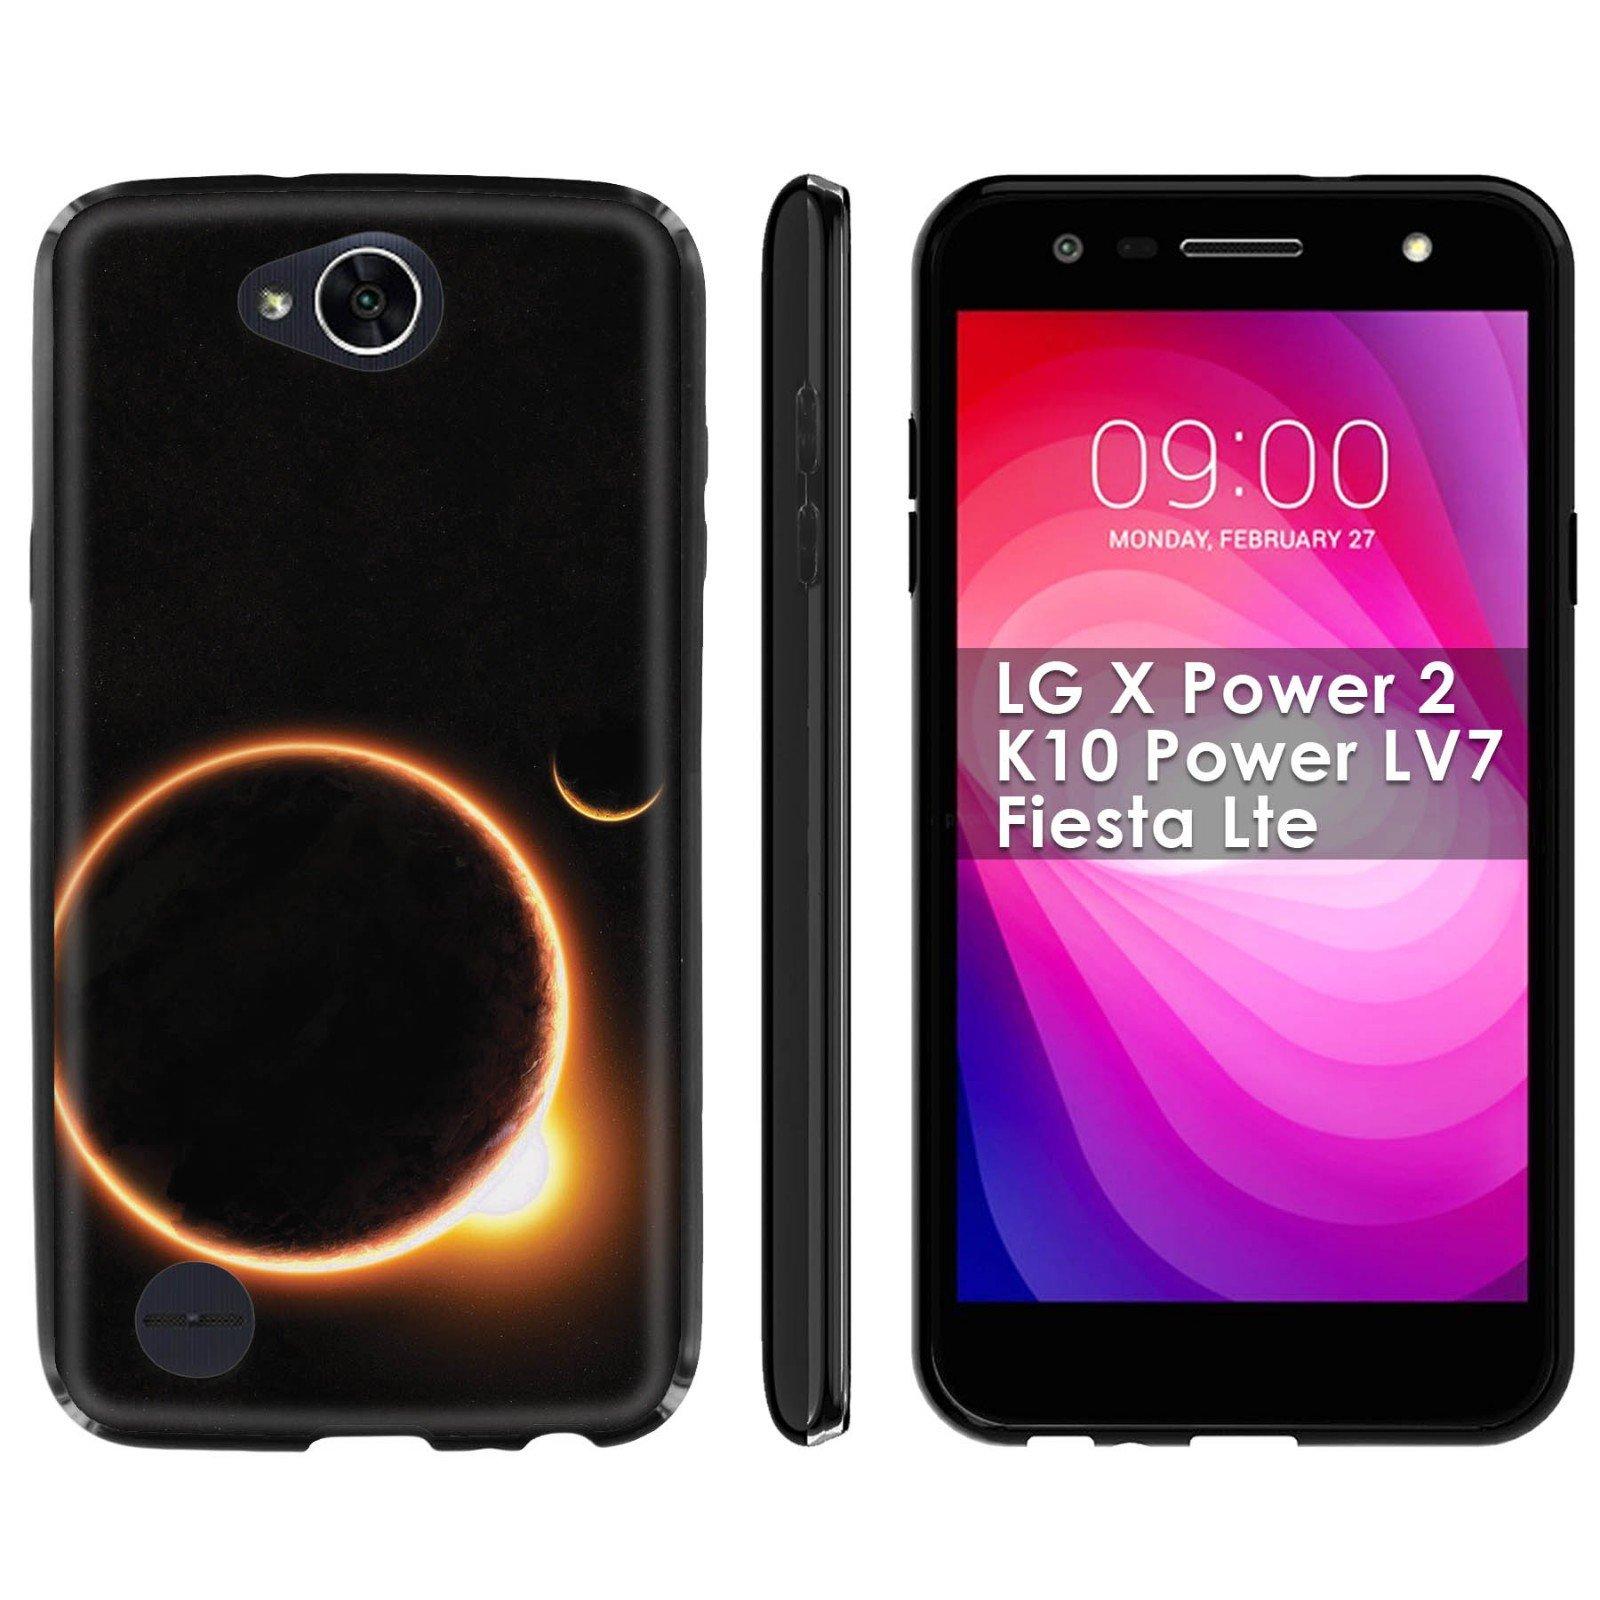 LG X Power 2/K10 Power LV7/Fiesta Lte Soft Mold [Mobiflare] [Black] Thin Gel Protect Cover - [Solar Eclipse] for LG X Power2/K10 Power LV7/Fiesta Lte [5.5'' Screen]